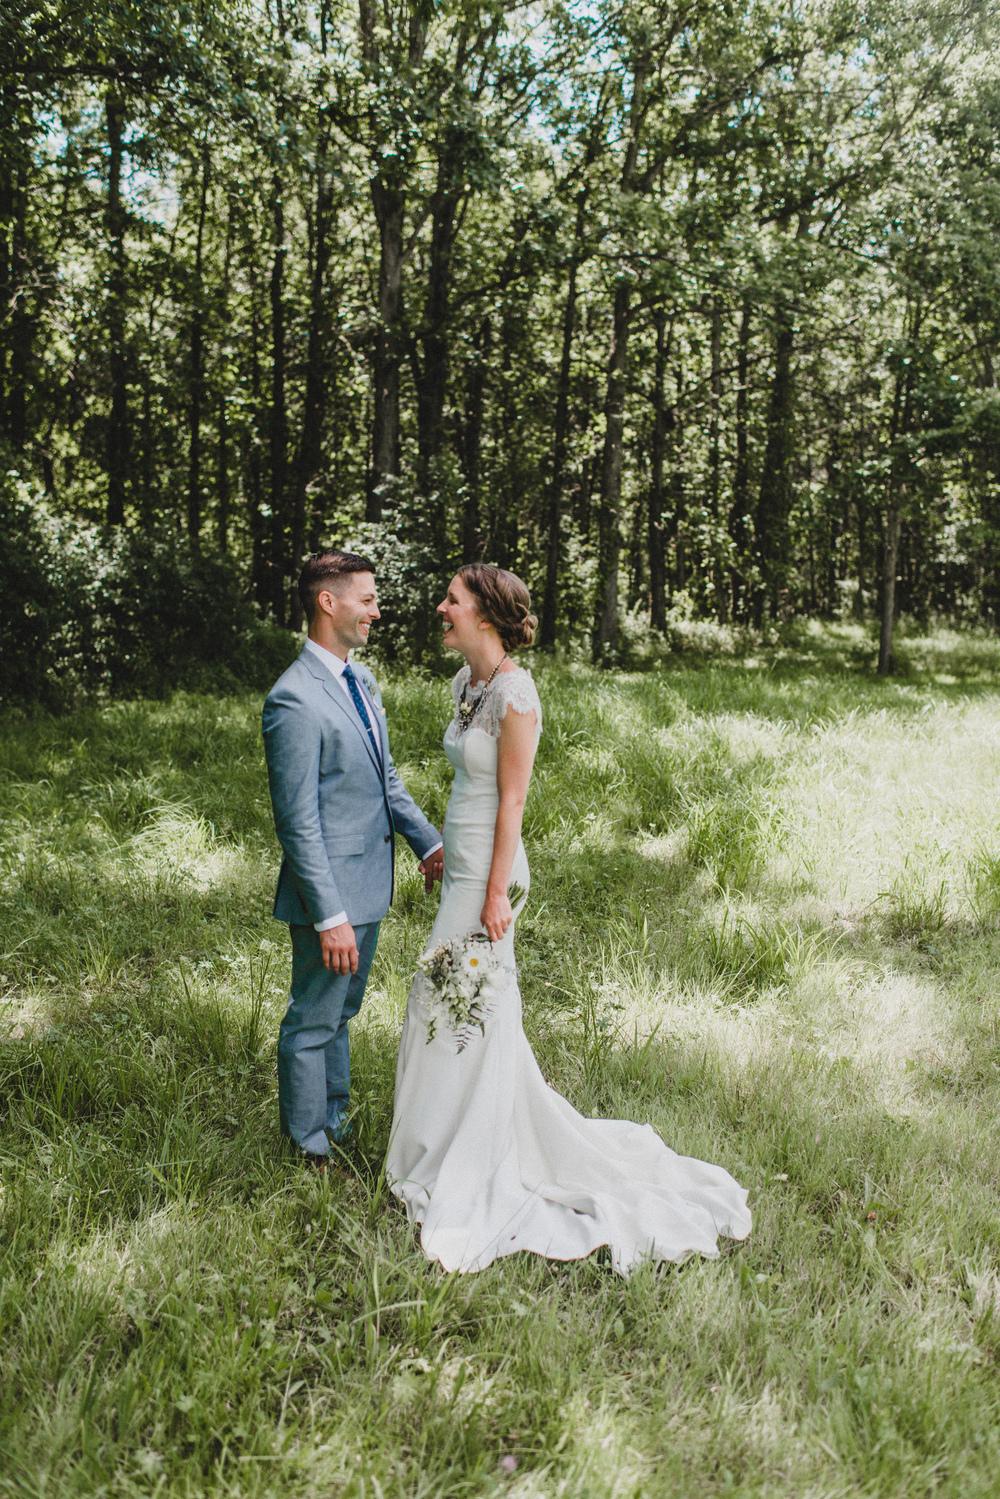 Intimate-Backyard-Farmhouse-Ohio-Wedding-Andi+Ben_Mallory+Justin-Photographers-78.JPG